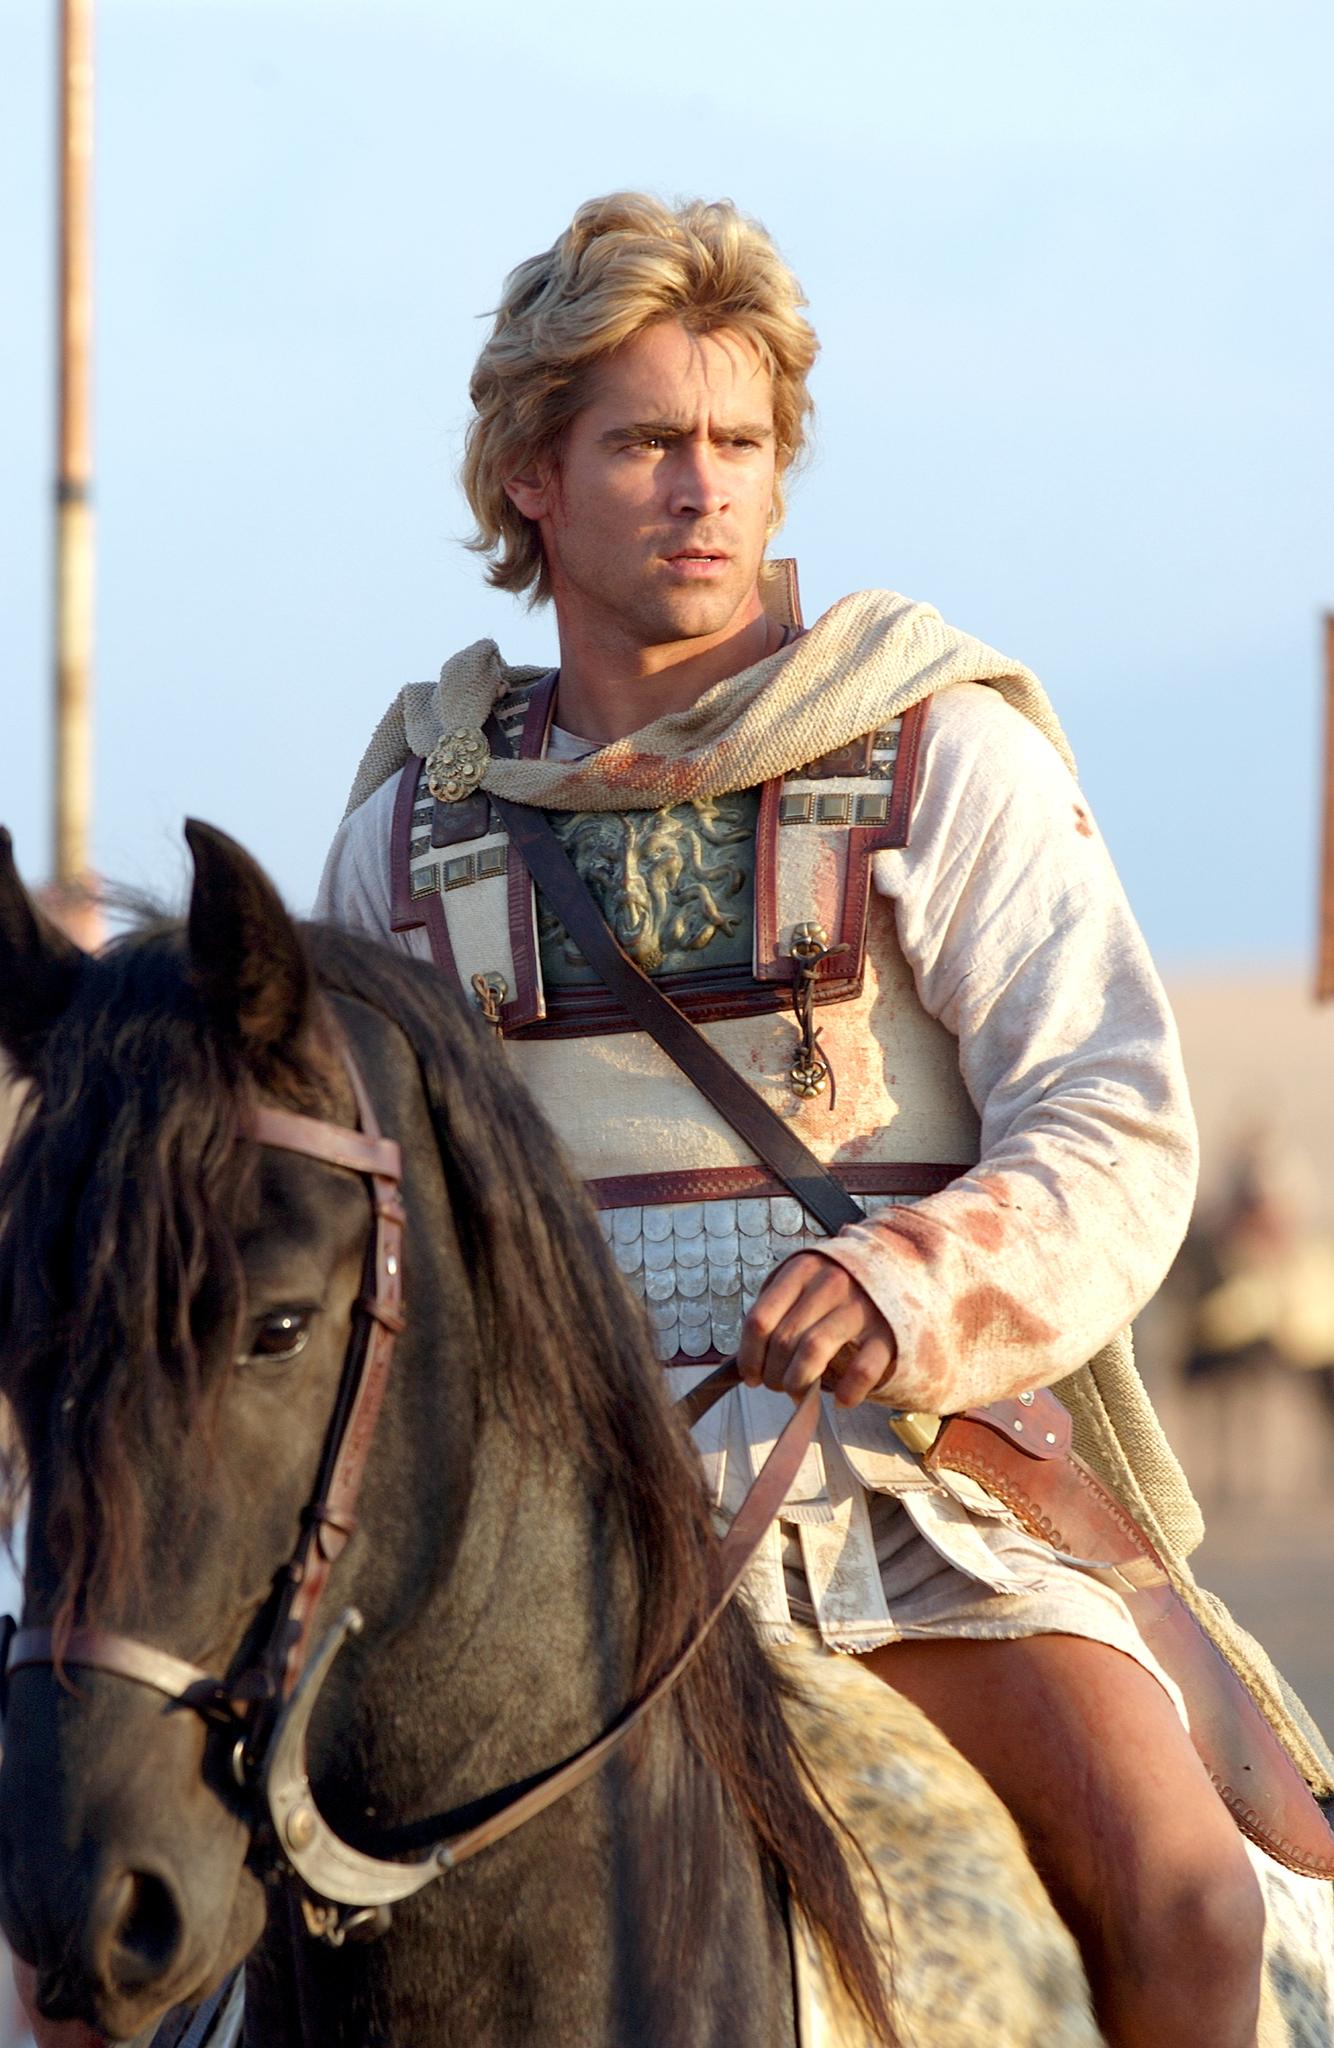 Colin Farrell in Alexander (2004)